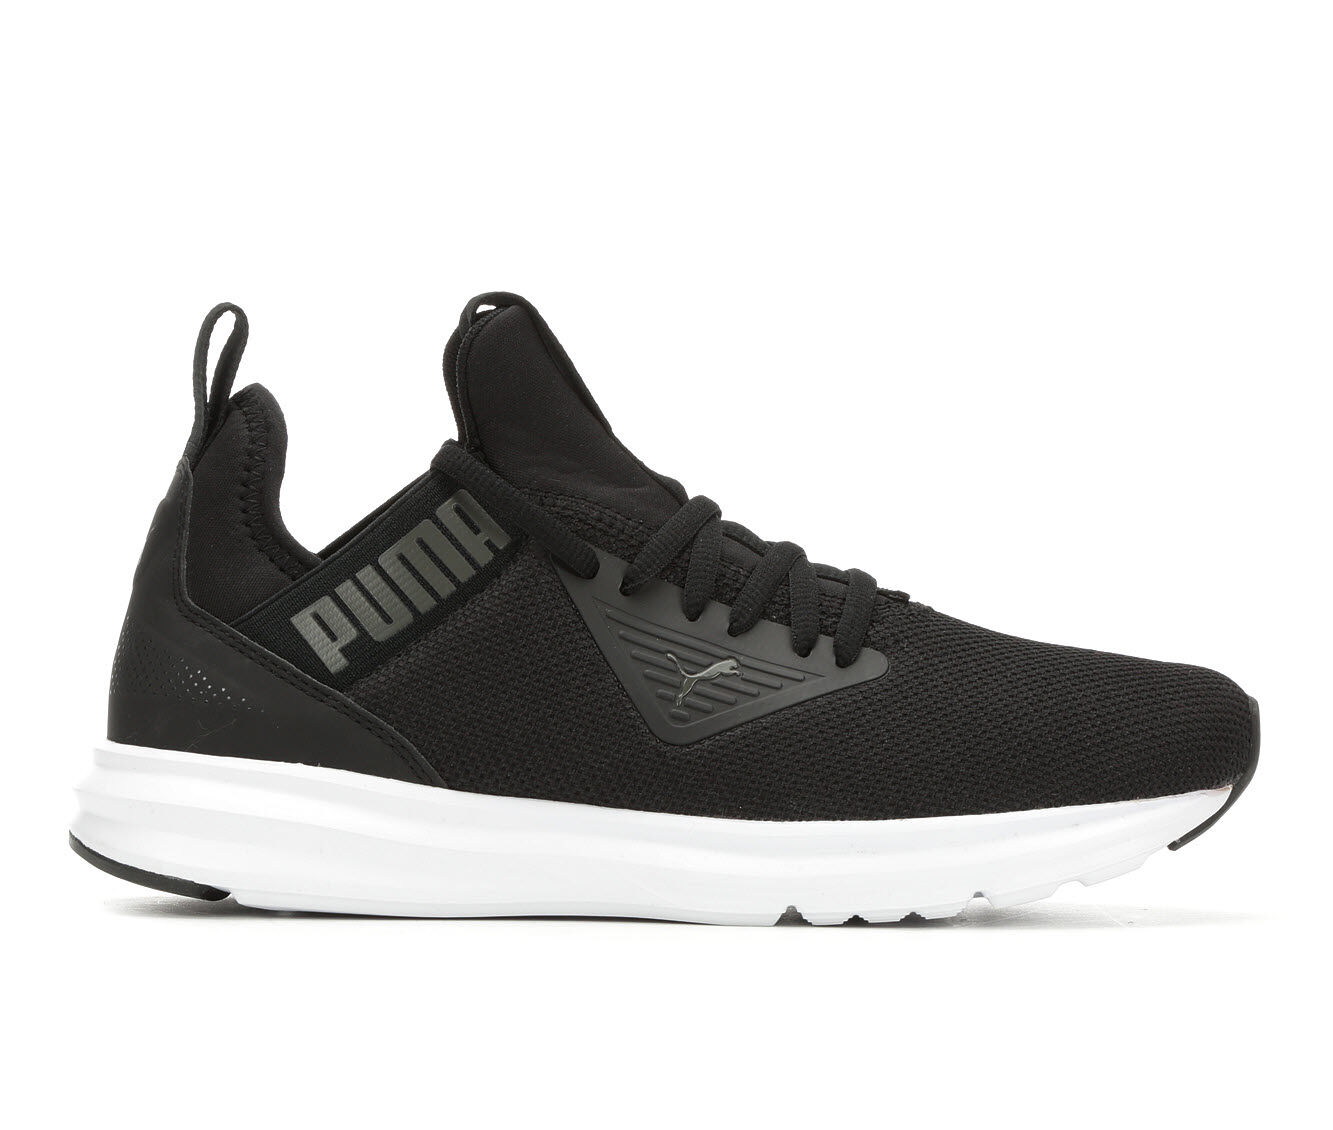 Women's Puma Enzo Beta Sneakers Black/White